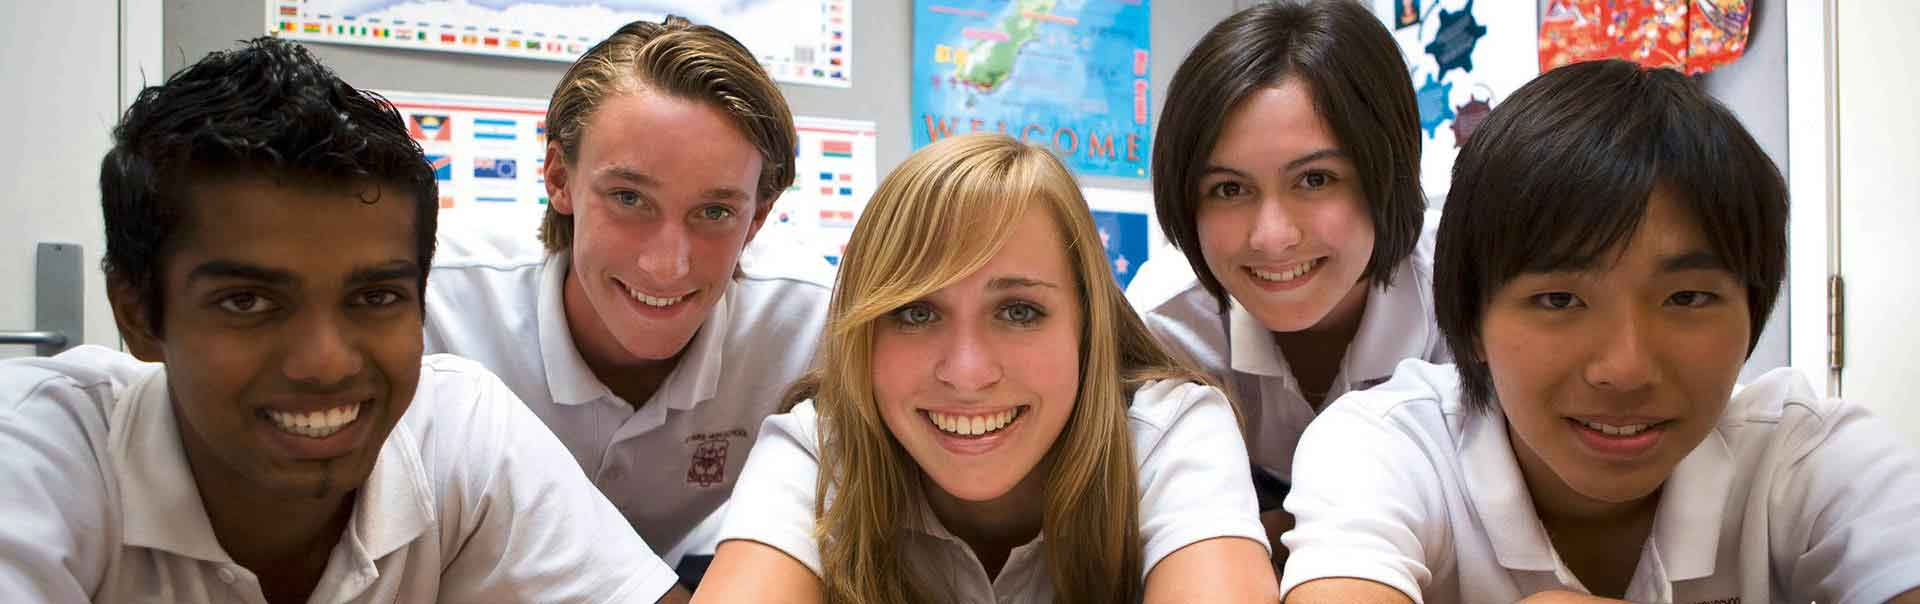 2019 Educatius High School Programs in New Zealand for International Students